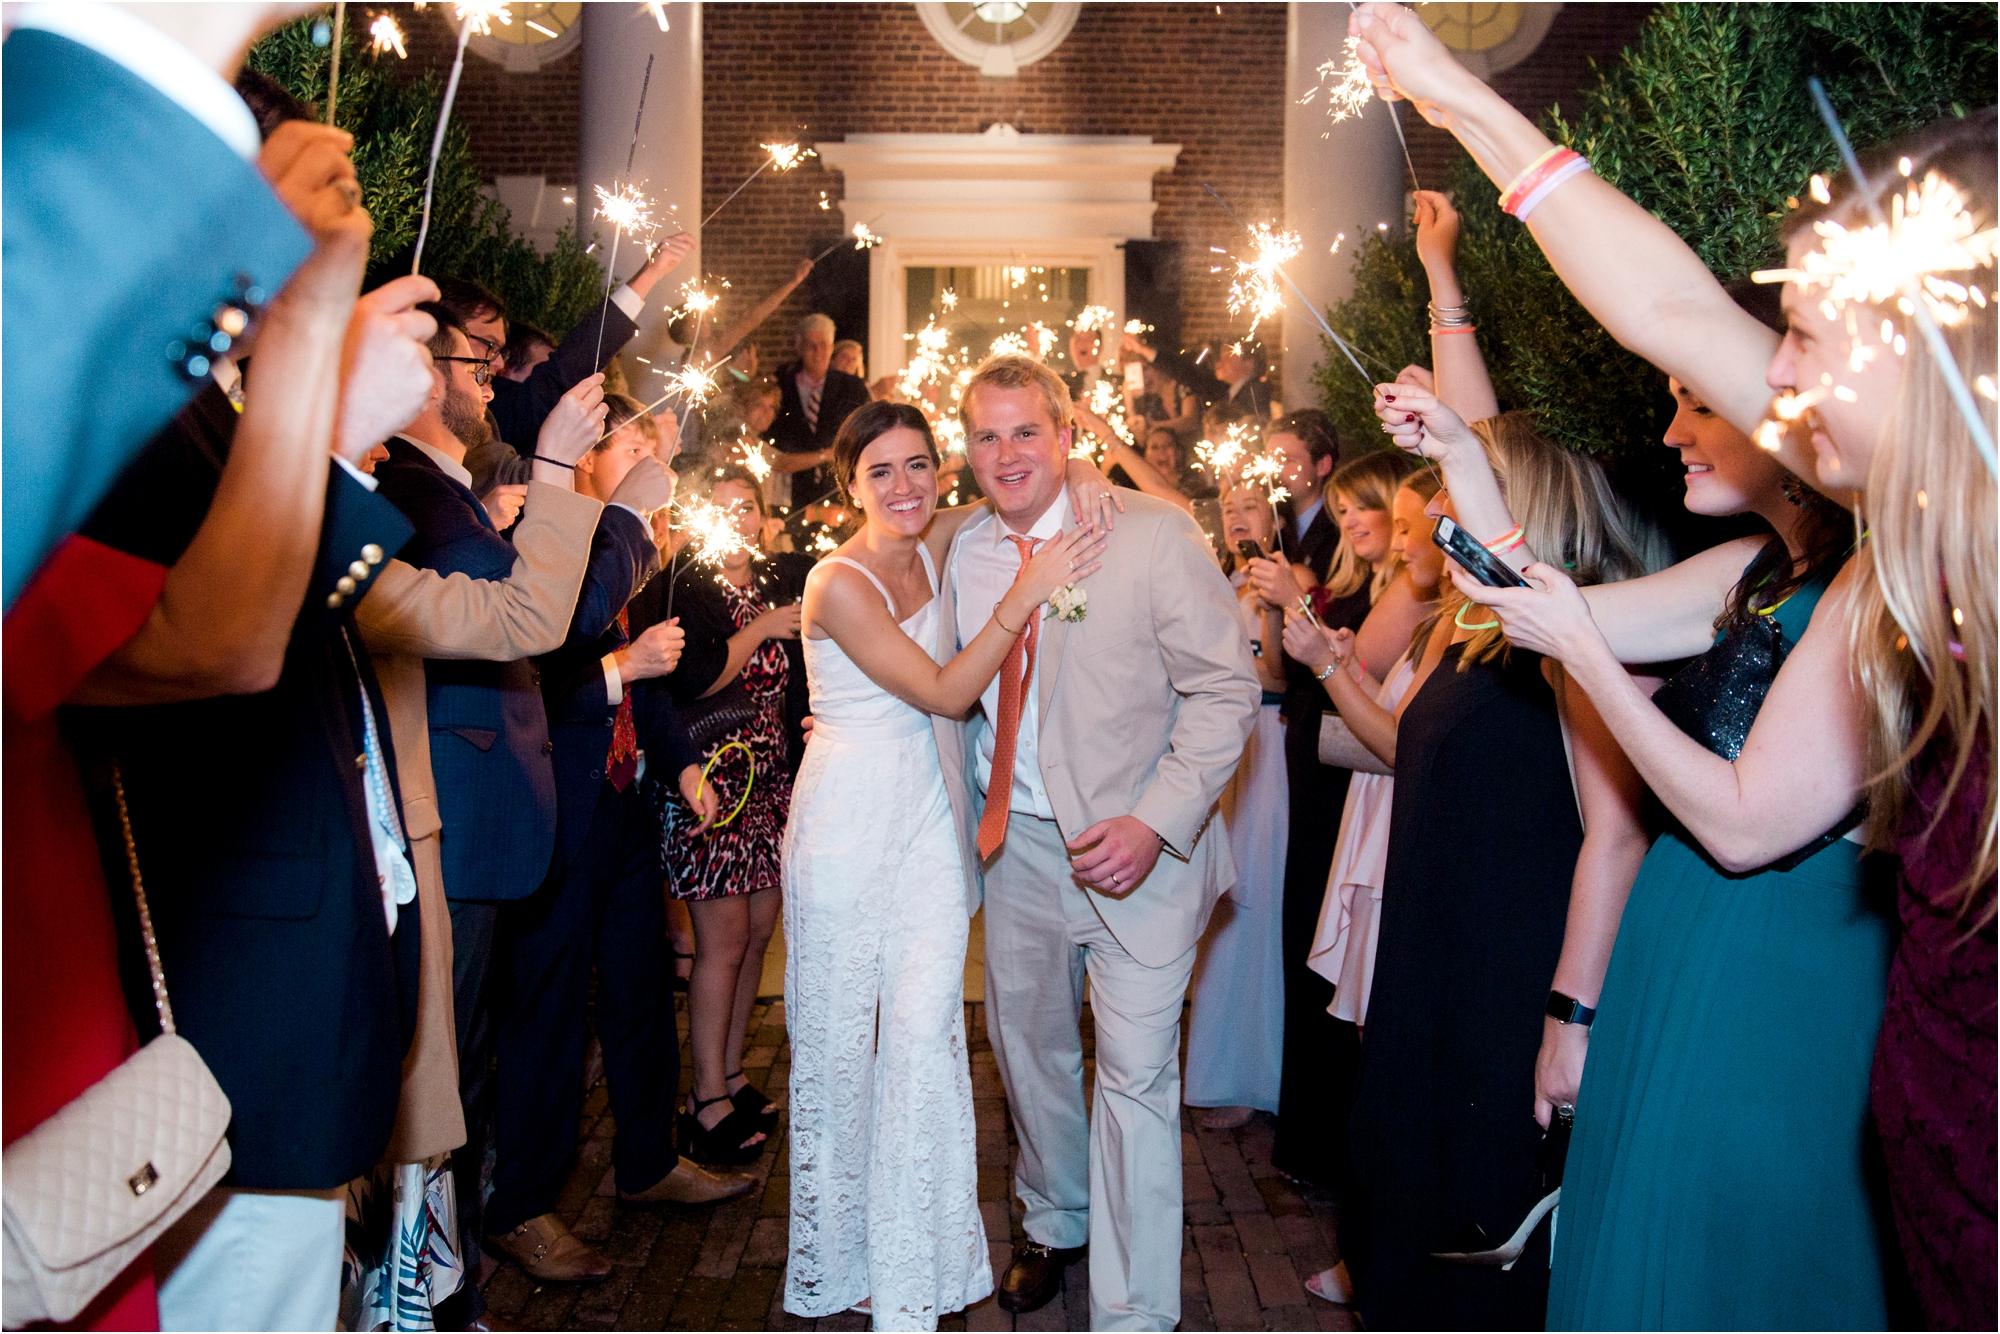 claire-thomas-farmington-country-club-charlottesville-virginia-wedding-photos_0063.jpg